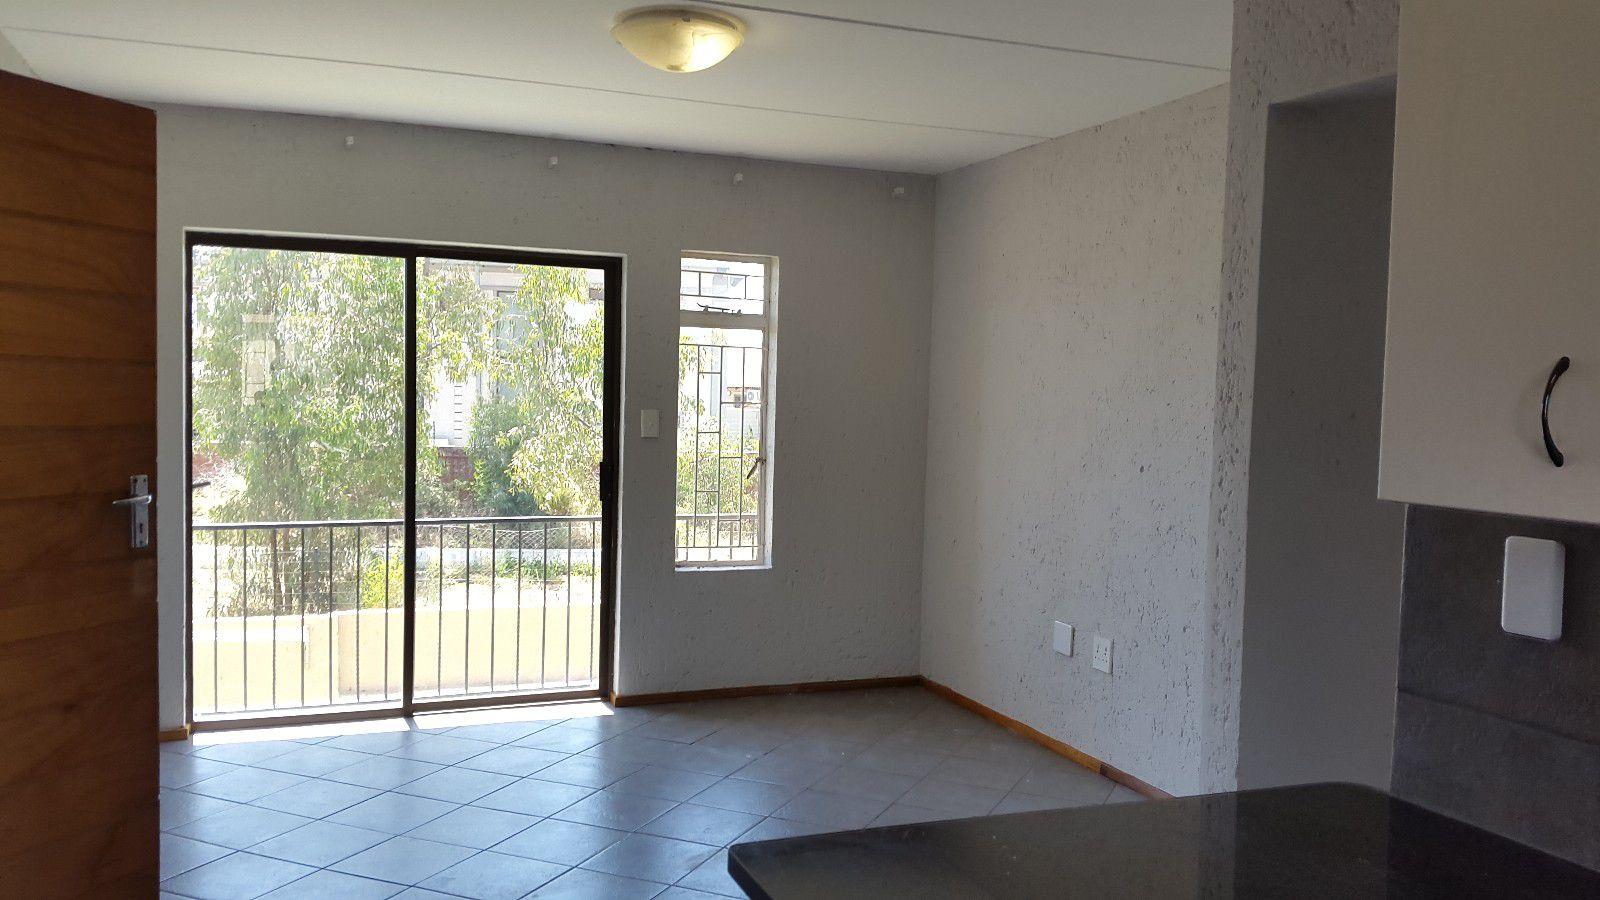 Baillie Park property for sale. Ref No: 13400060. Picture no 5